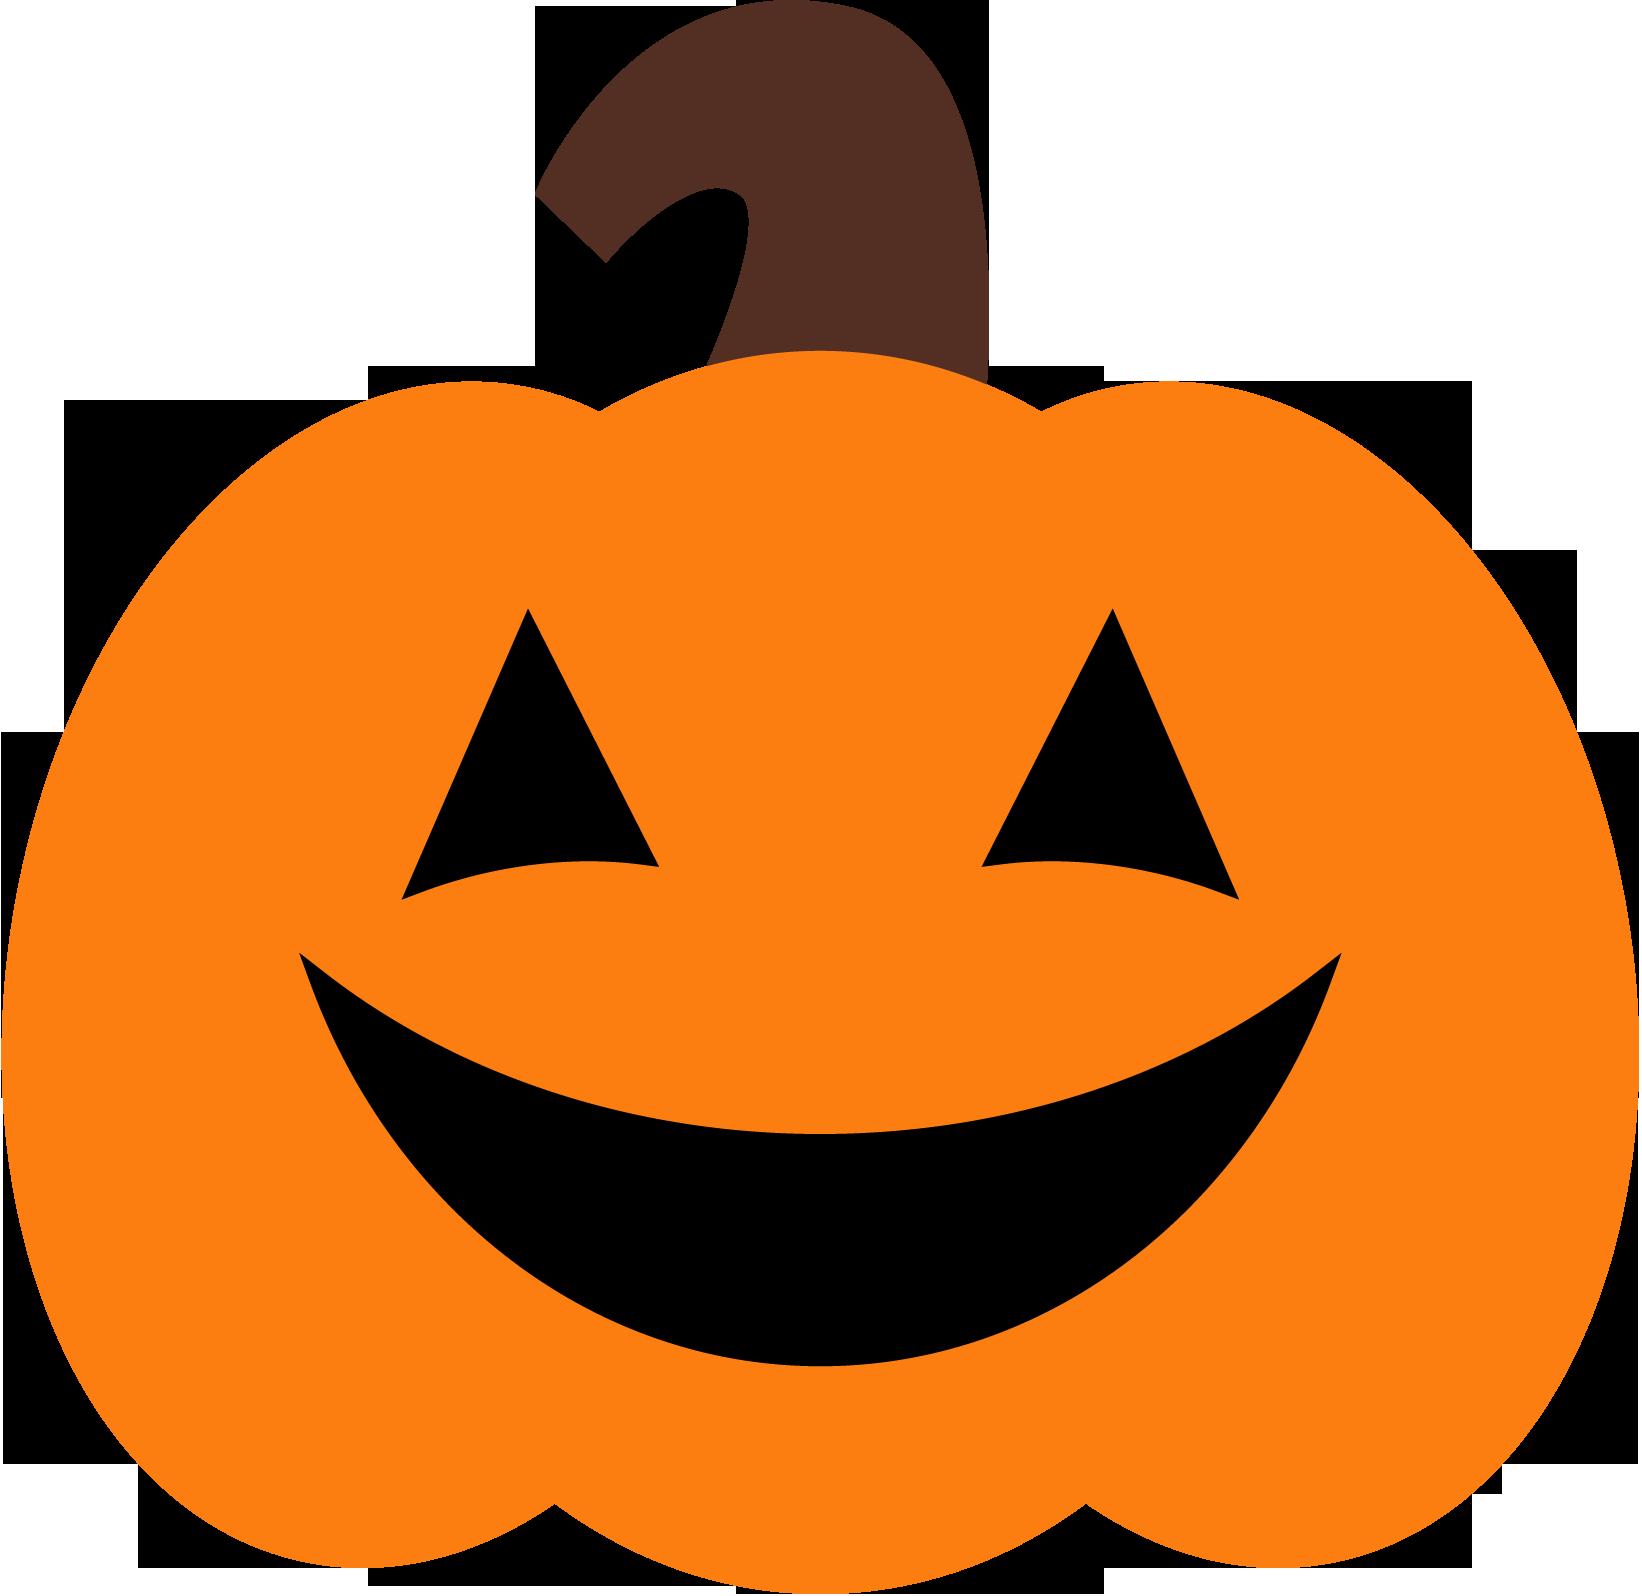 1642x1596 Cute Pumpkin Clip Art Images Danaalgk Top